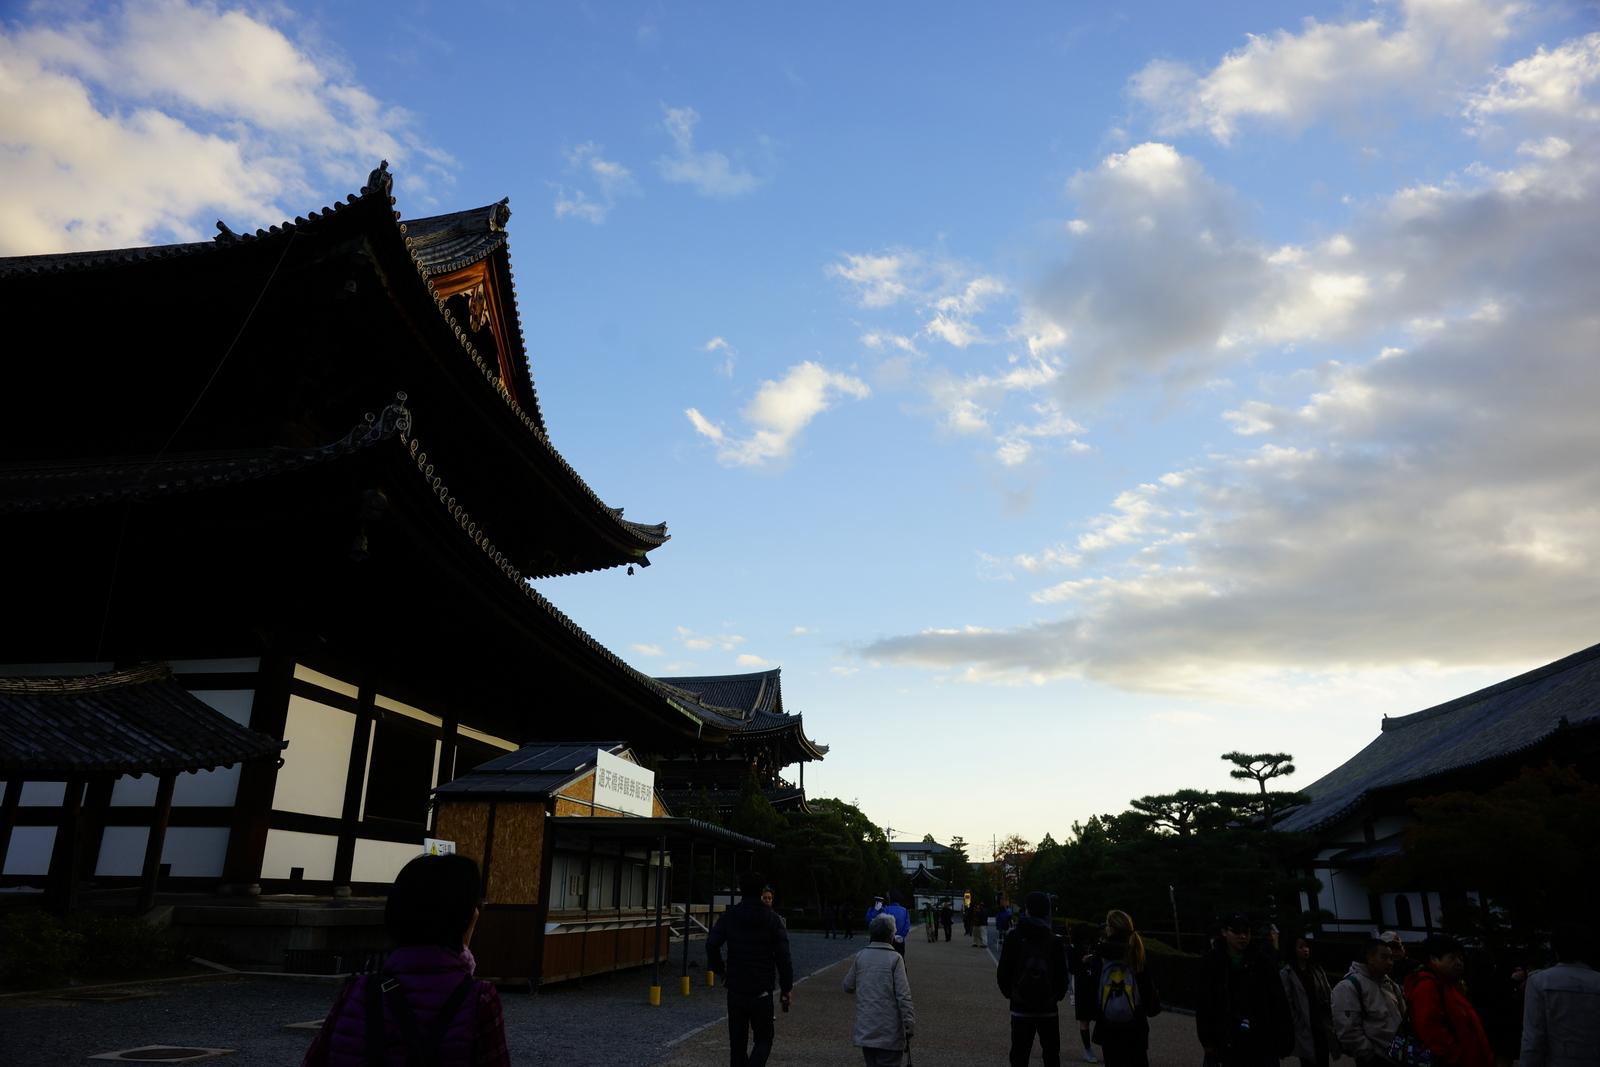 22 Daigohigashiōjichō, Fushimi-ku, Kyōto-shi, Kyōto-fu -日本Daigoji的日出日落时间表